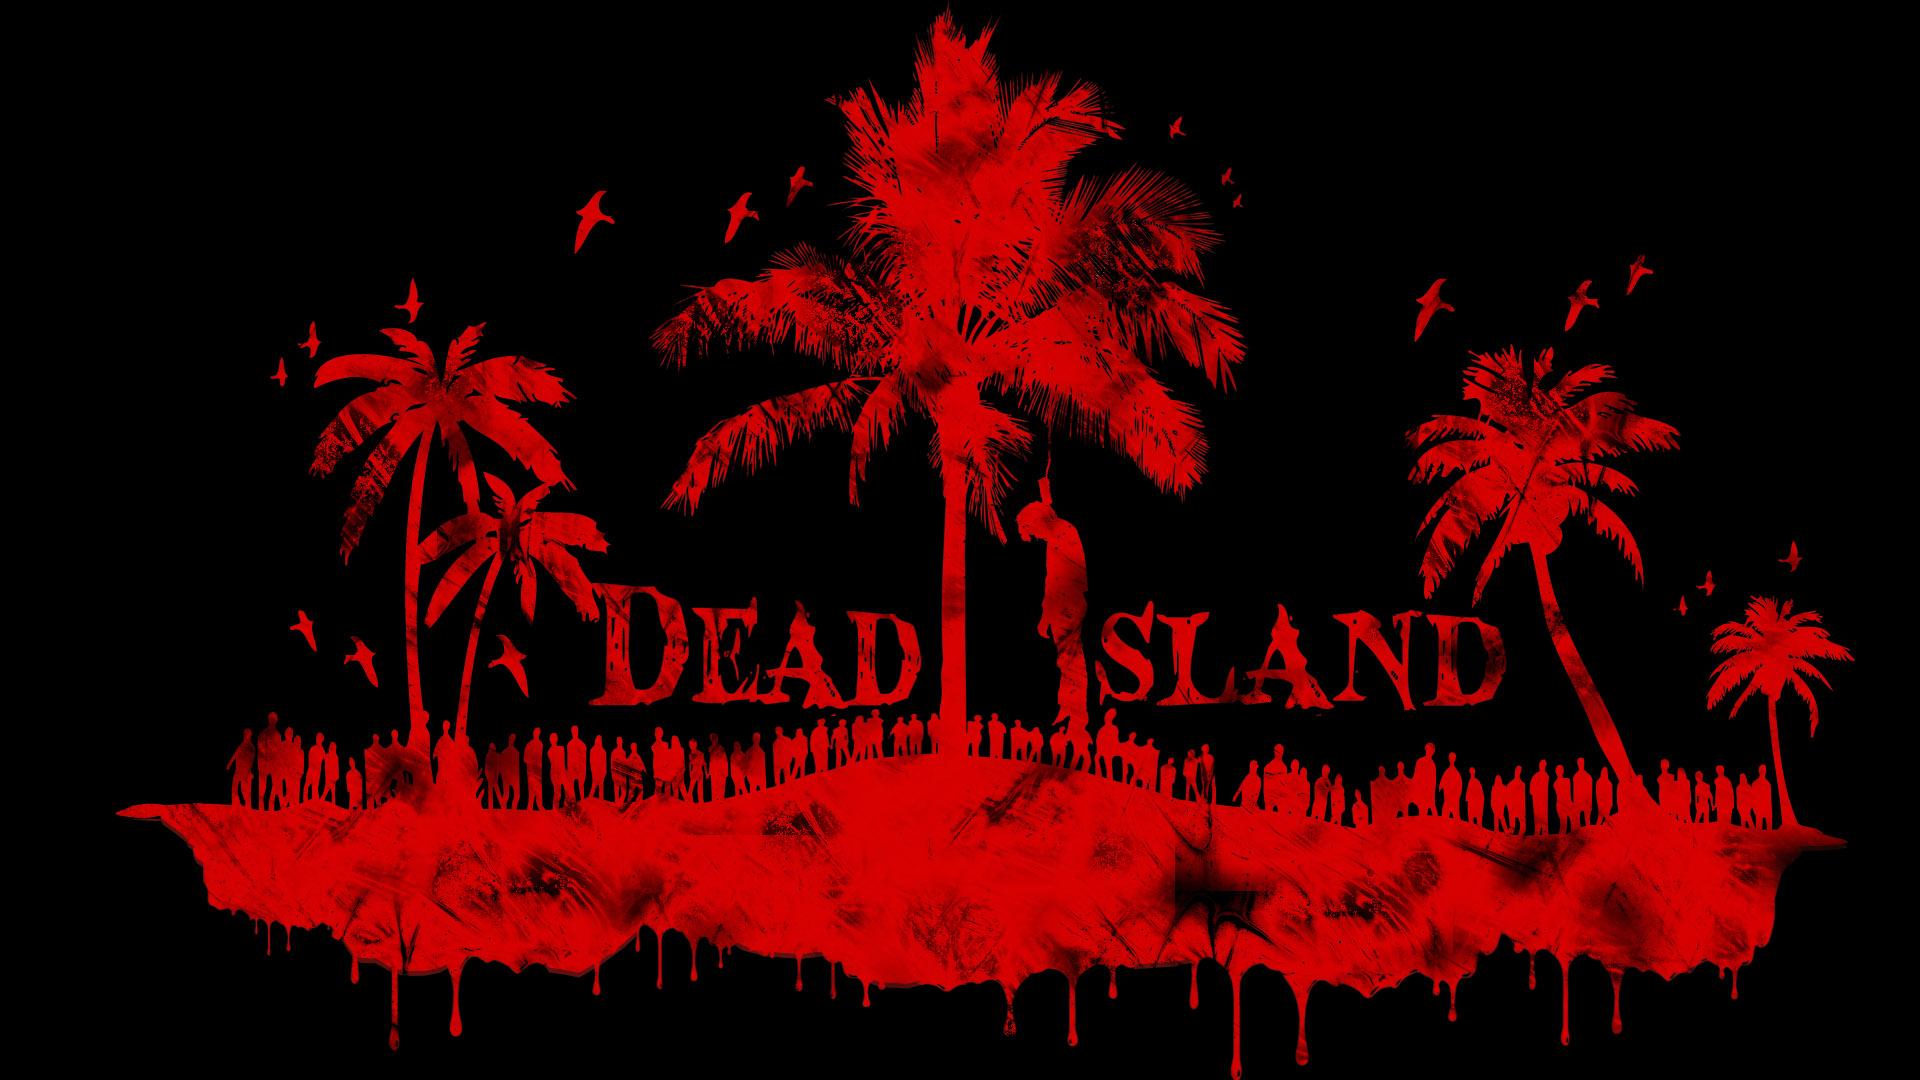 HD 16 9 2400x1350 2048x1152 Source 91 Dead Island Wallpaper We Love Movies Hd